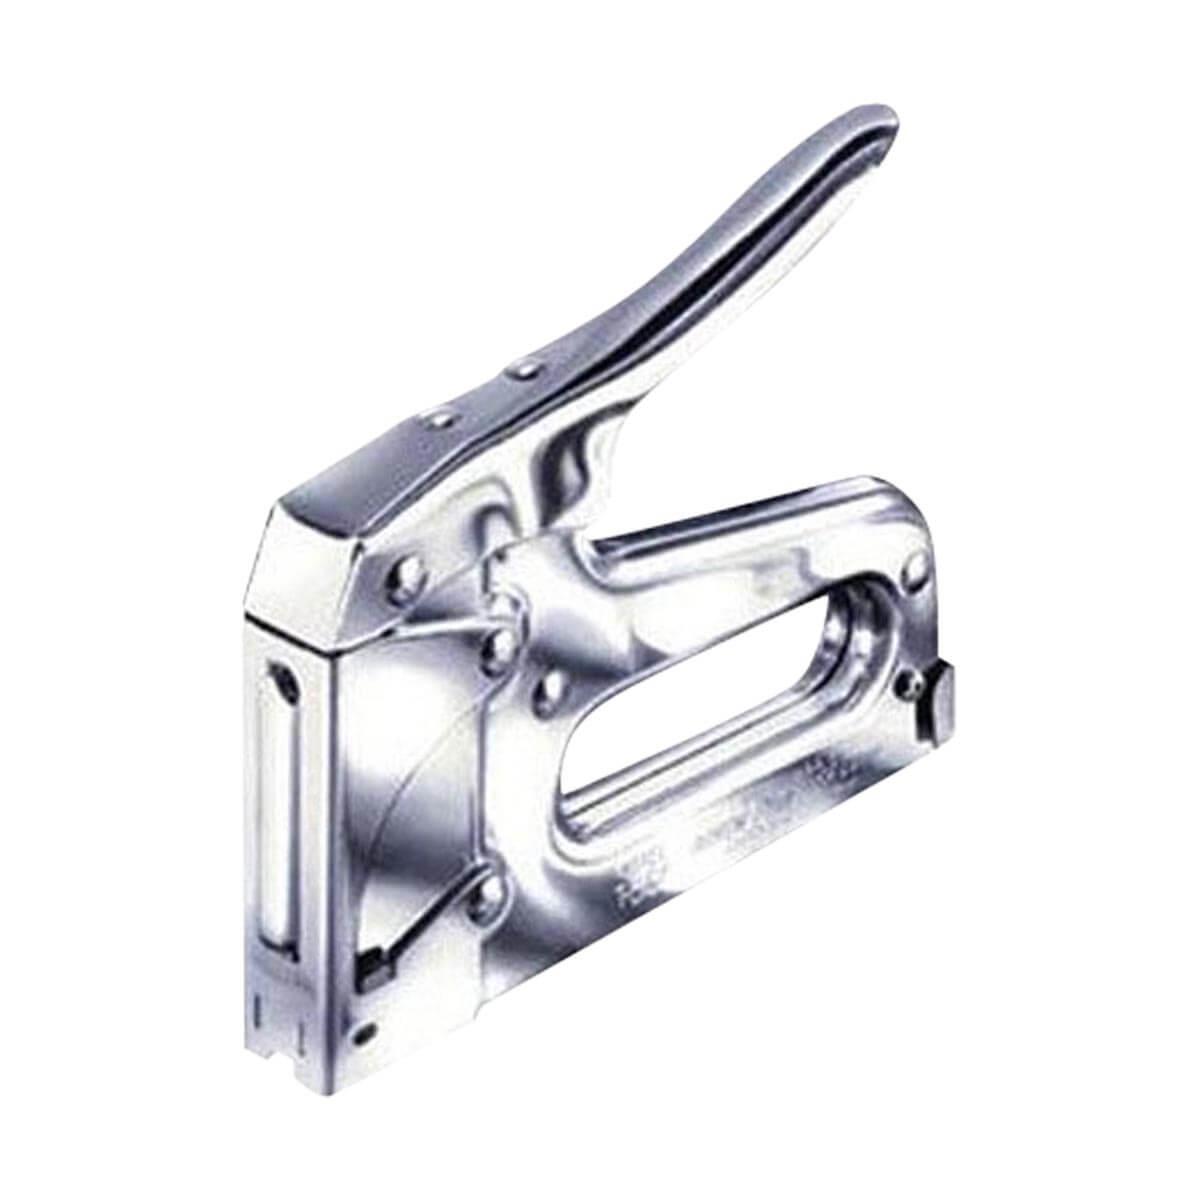 Arrow HD tacker Gun - T50